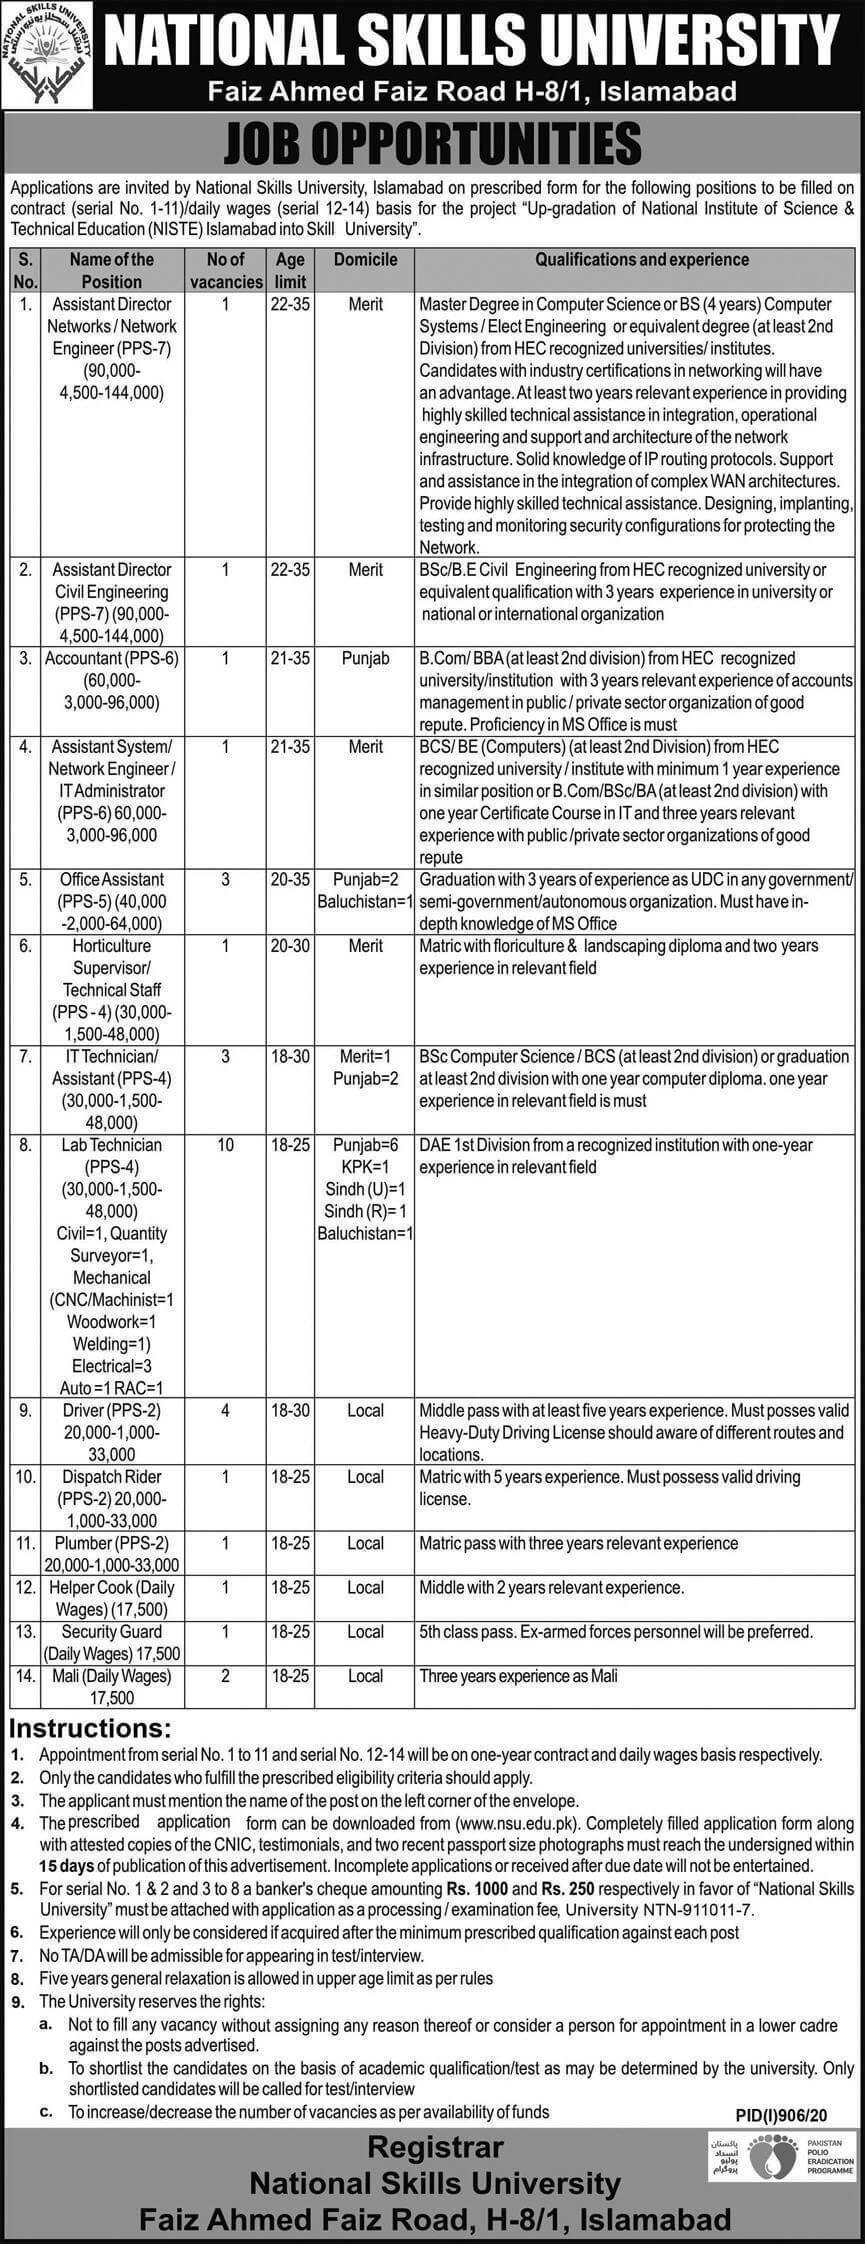 National Skills University Islamabad Jobs 2020 | Apply Online